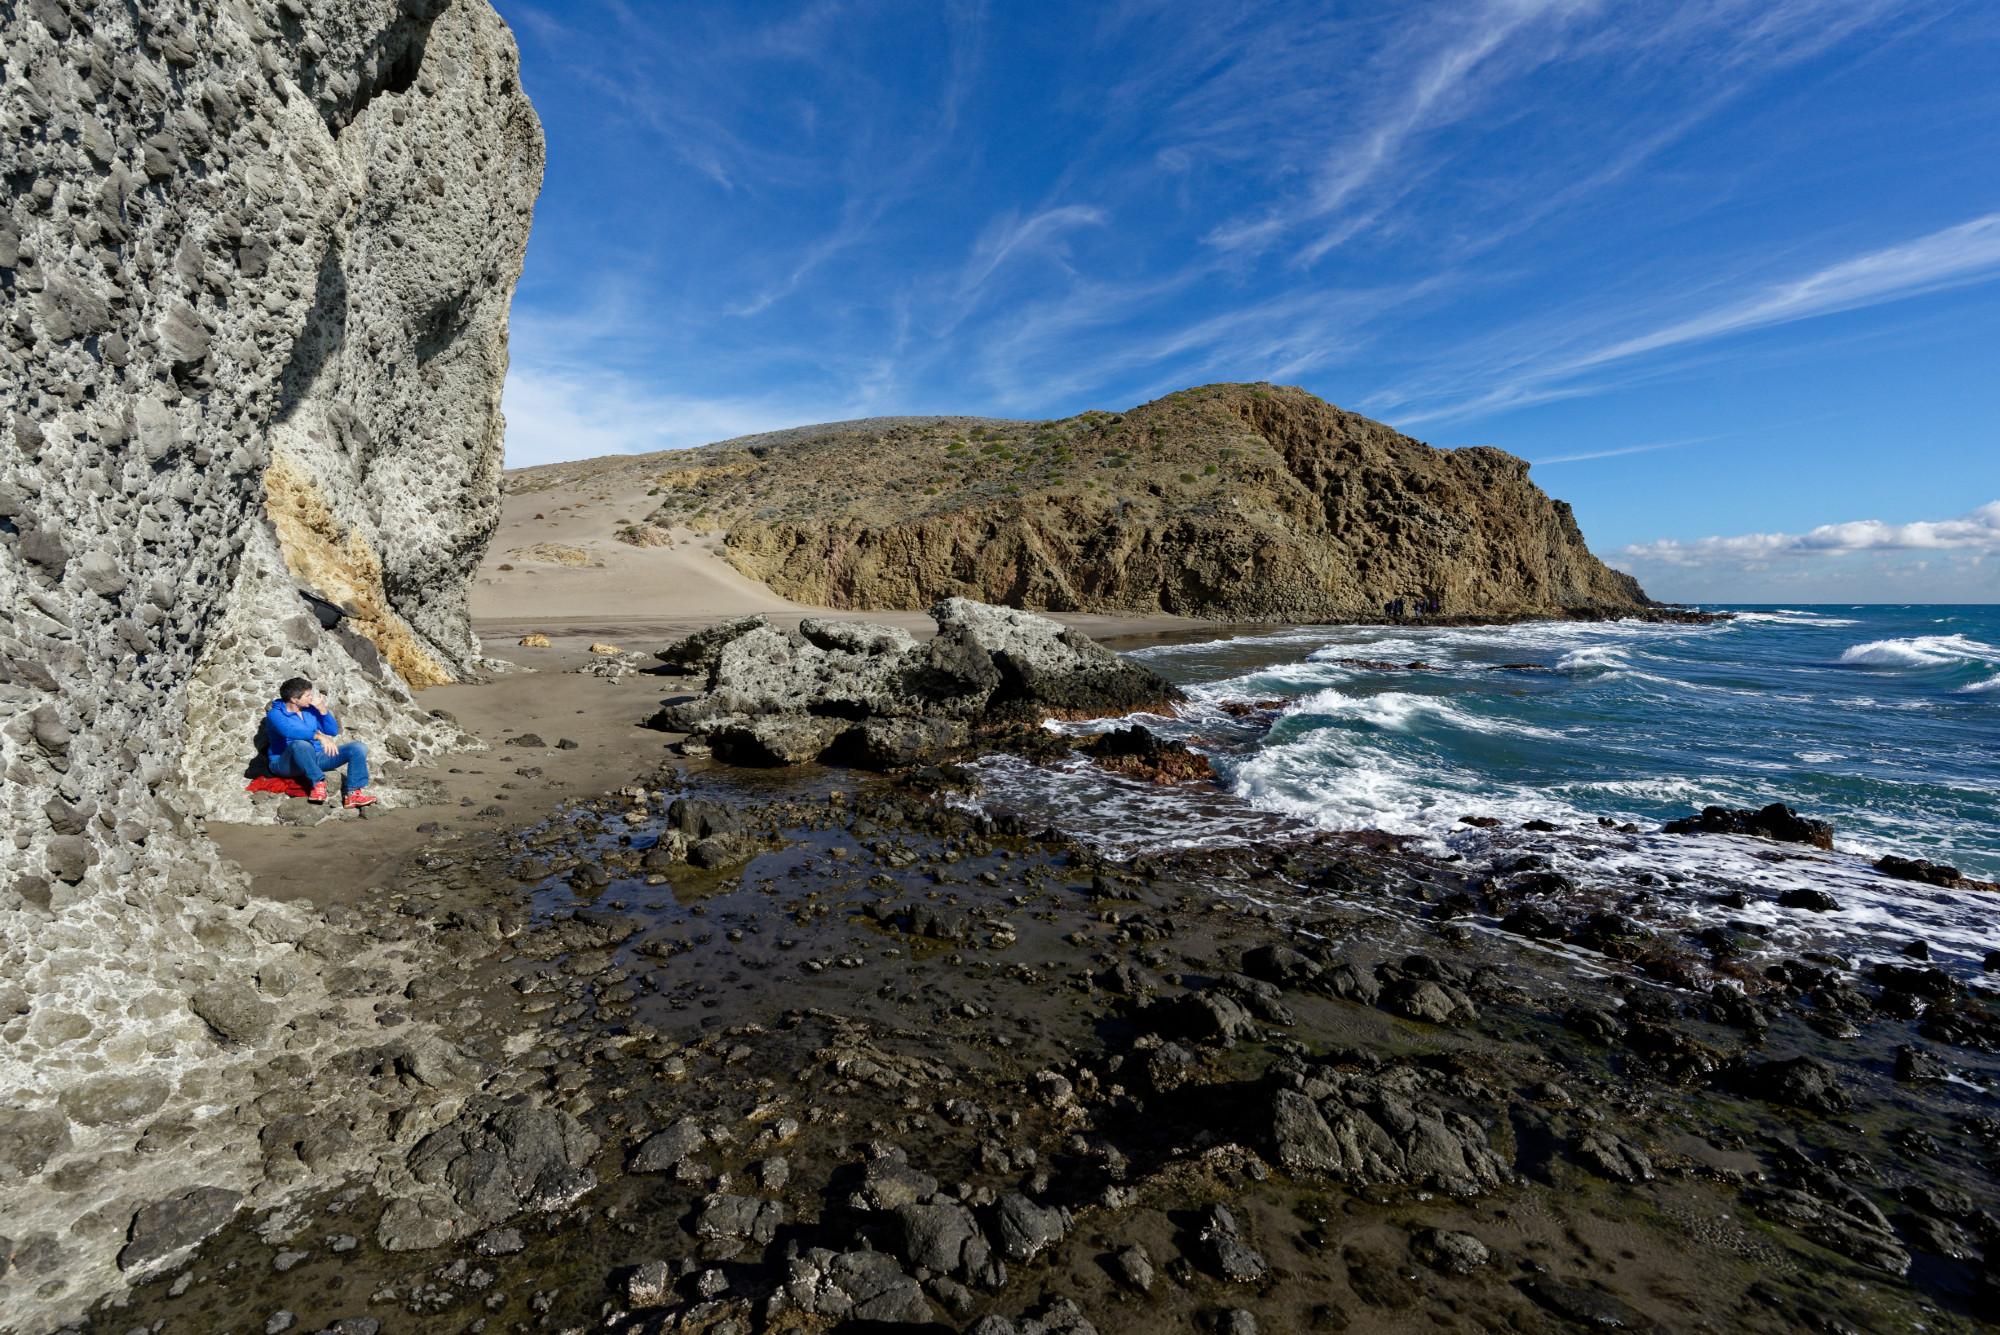 171214-San Jose-Playa del Monsul (Cabo de Gata-Andalousie) (174)